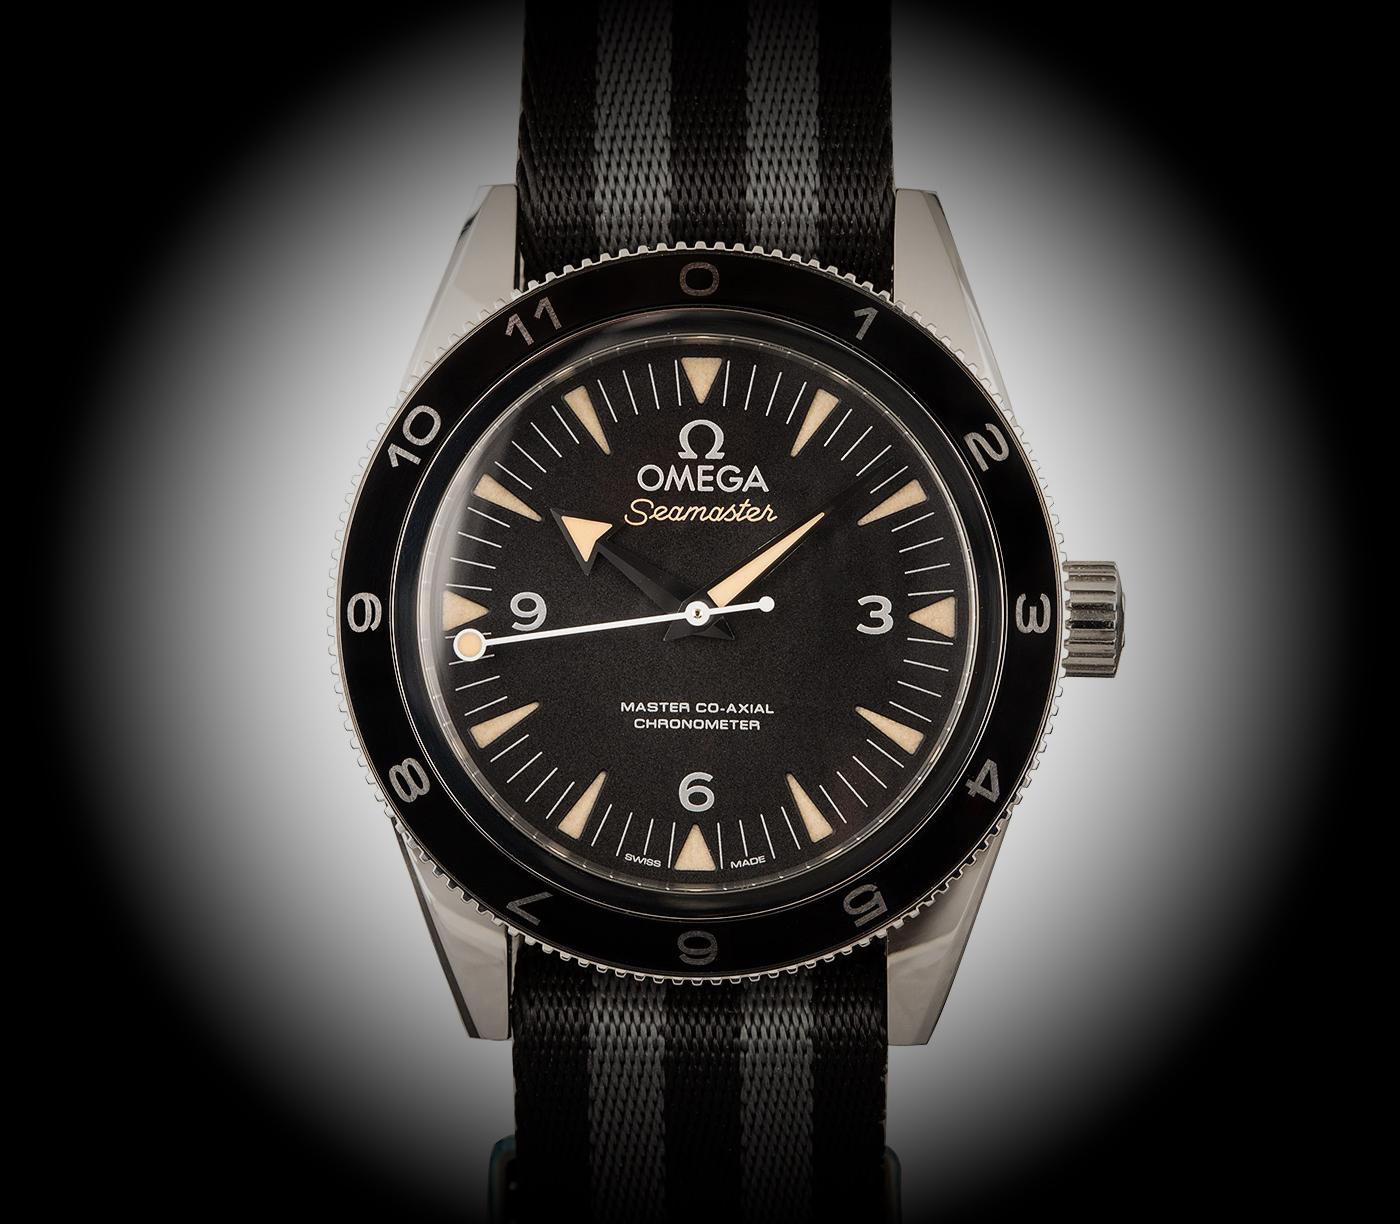 Iconic_watches_of_Hollywood_omega_seamaster_300_daniel_craig-Europa_star_watch_magazine_2020